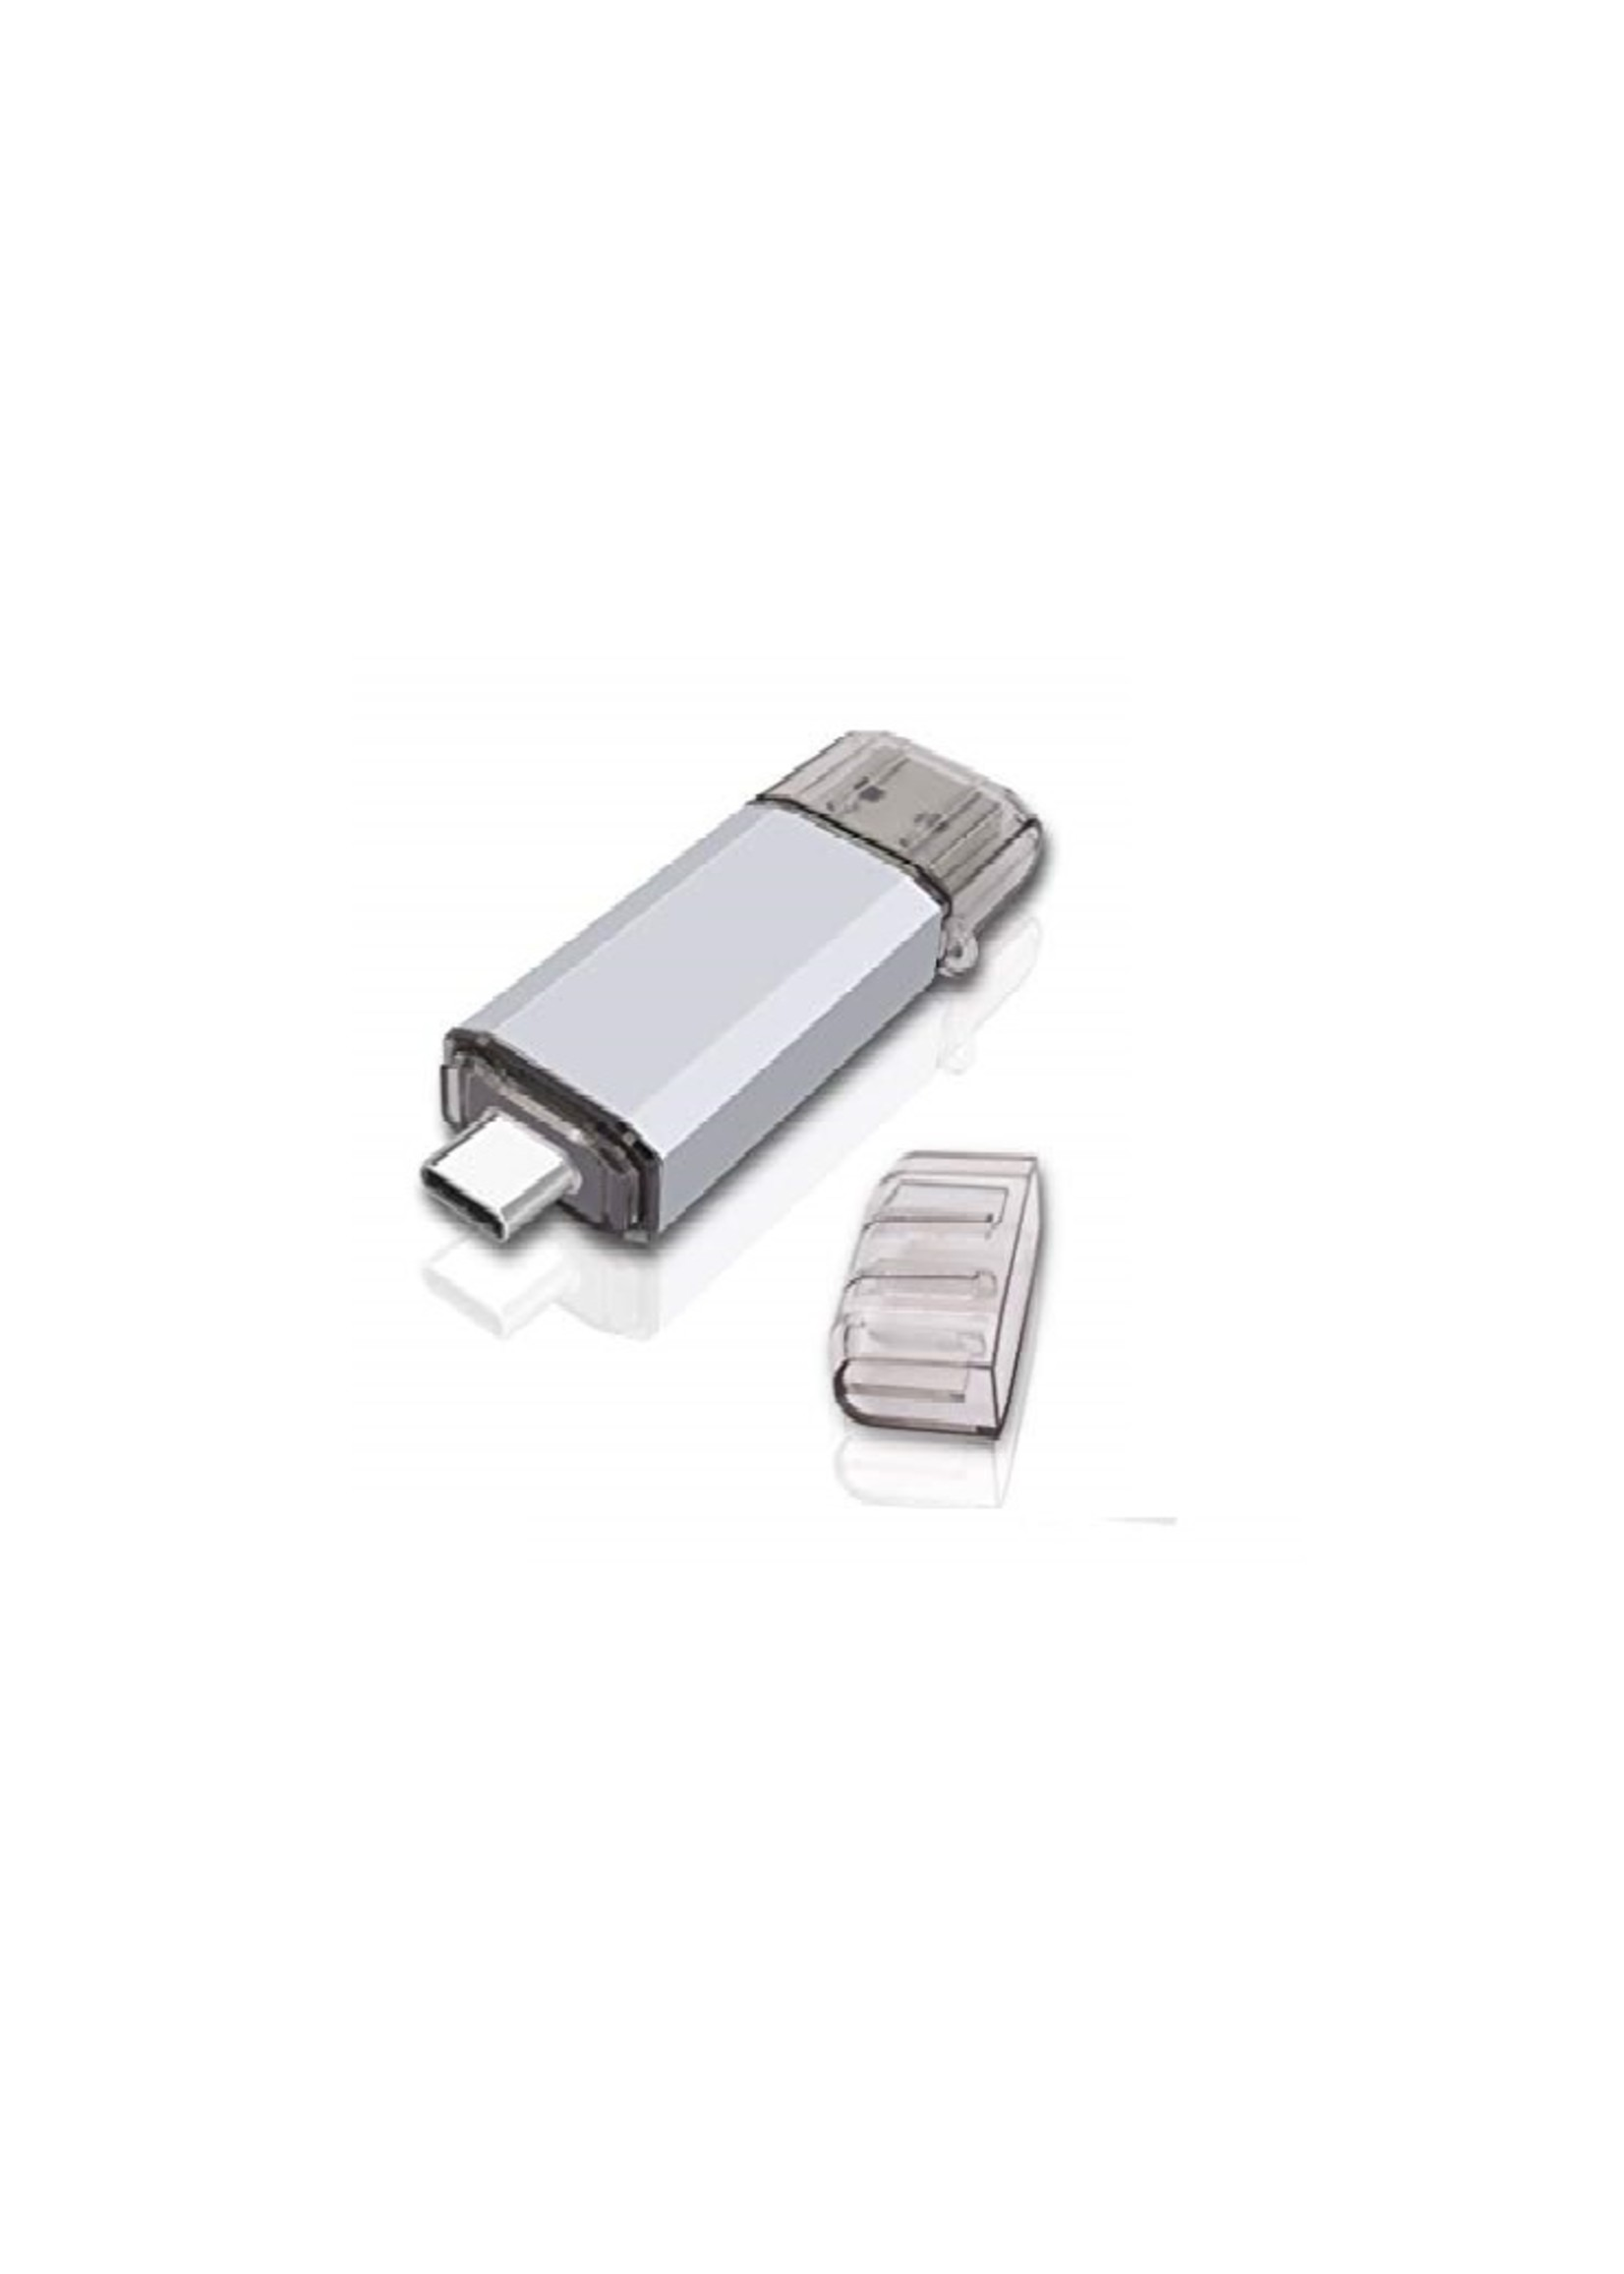 32GB USB / Type C Dual Flash Drive Memory